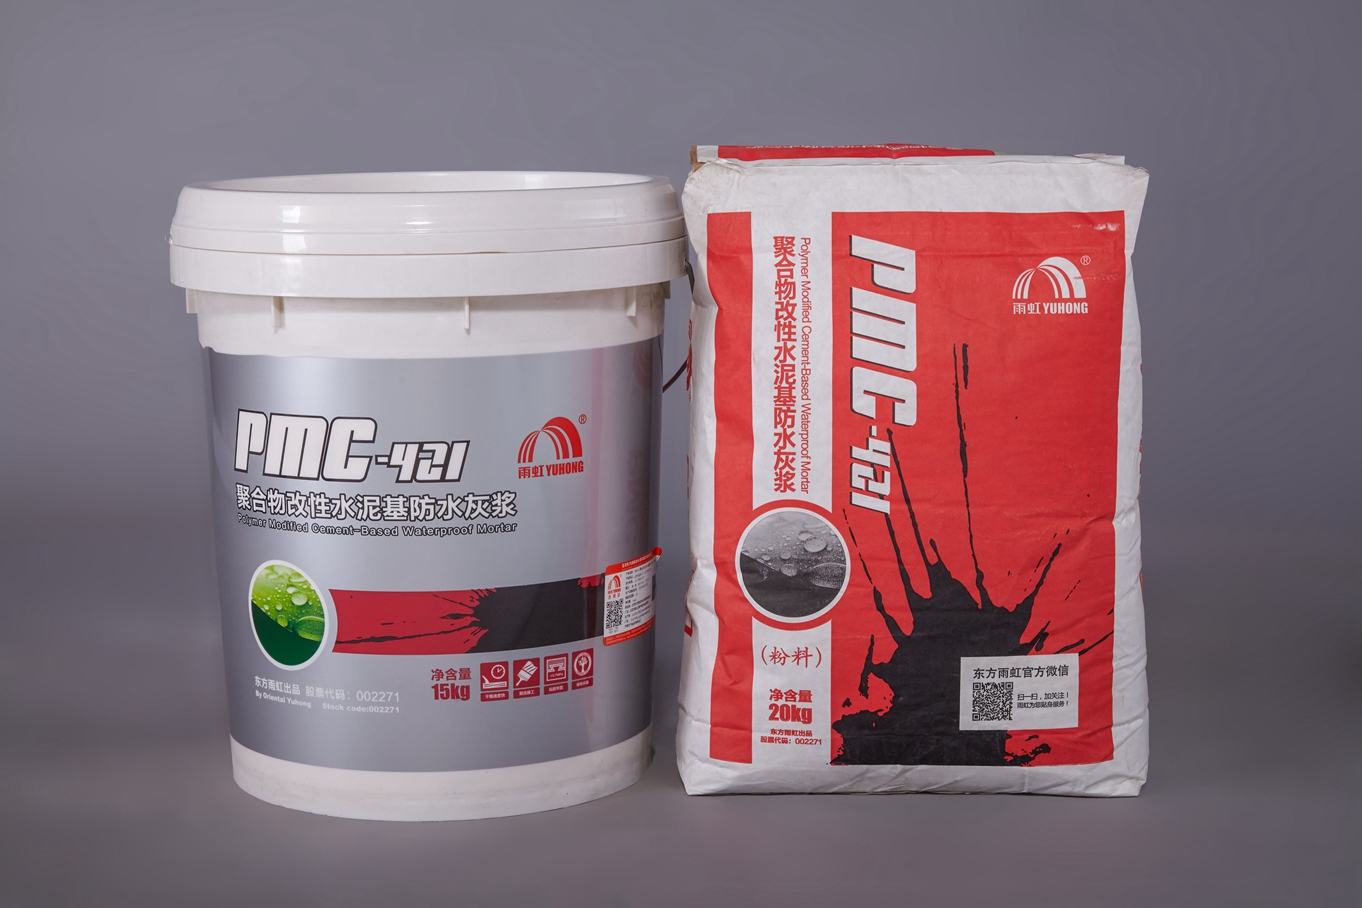 PMC-421 聚合物改性水泥基<em style='color:red'>防水灰浆</em>图片